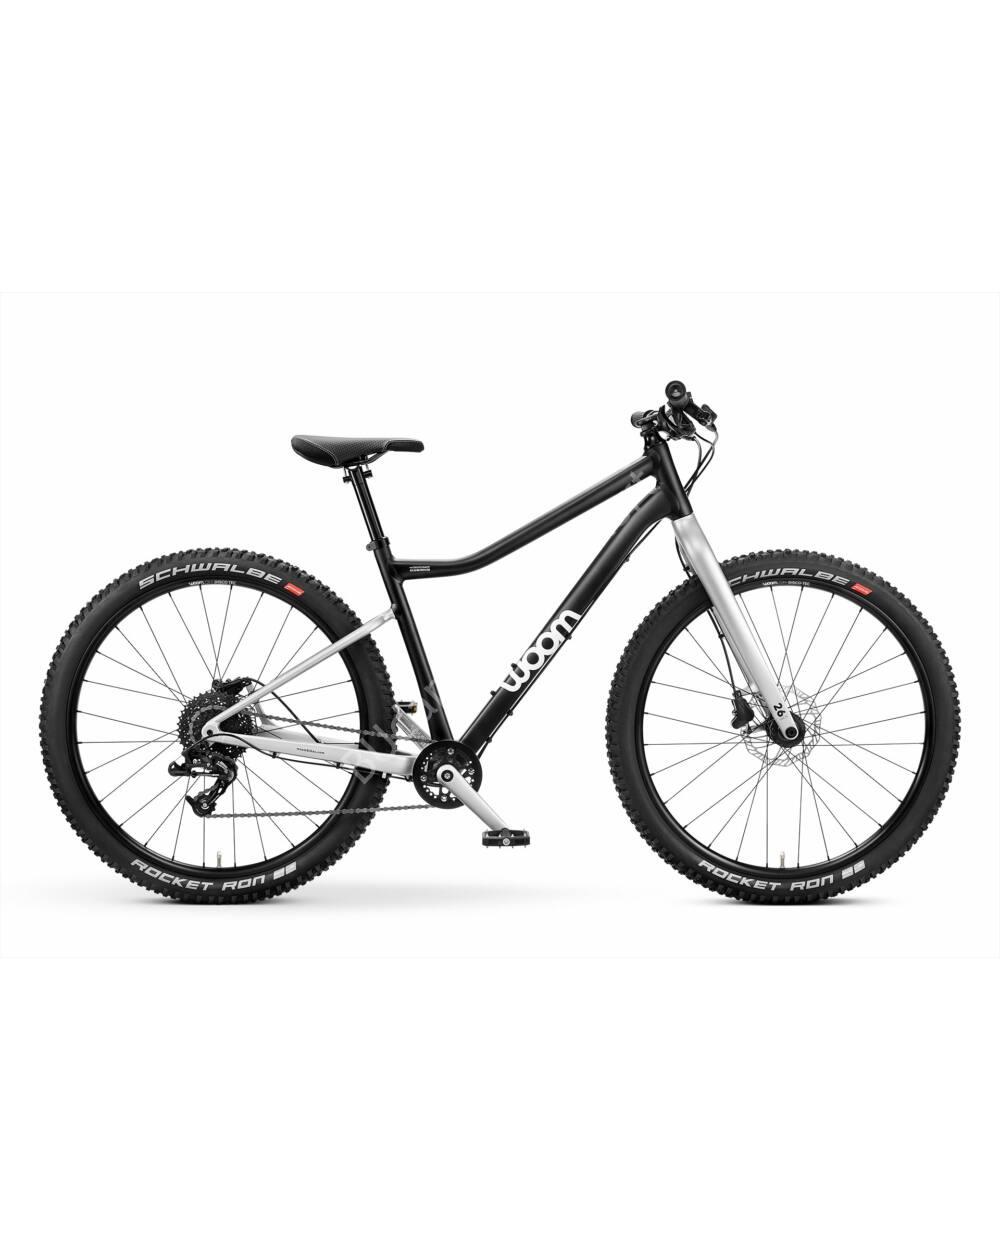 "Woom OFF 6 26"" kerékpár, 140-165 cm, 9.3 kg"